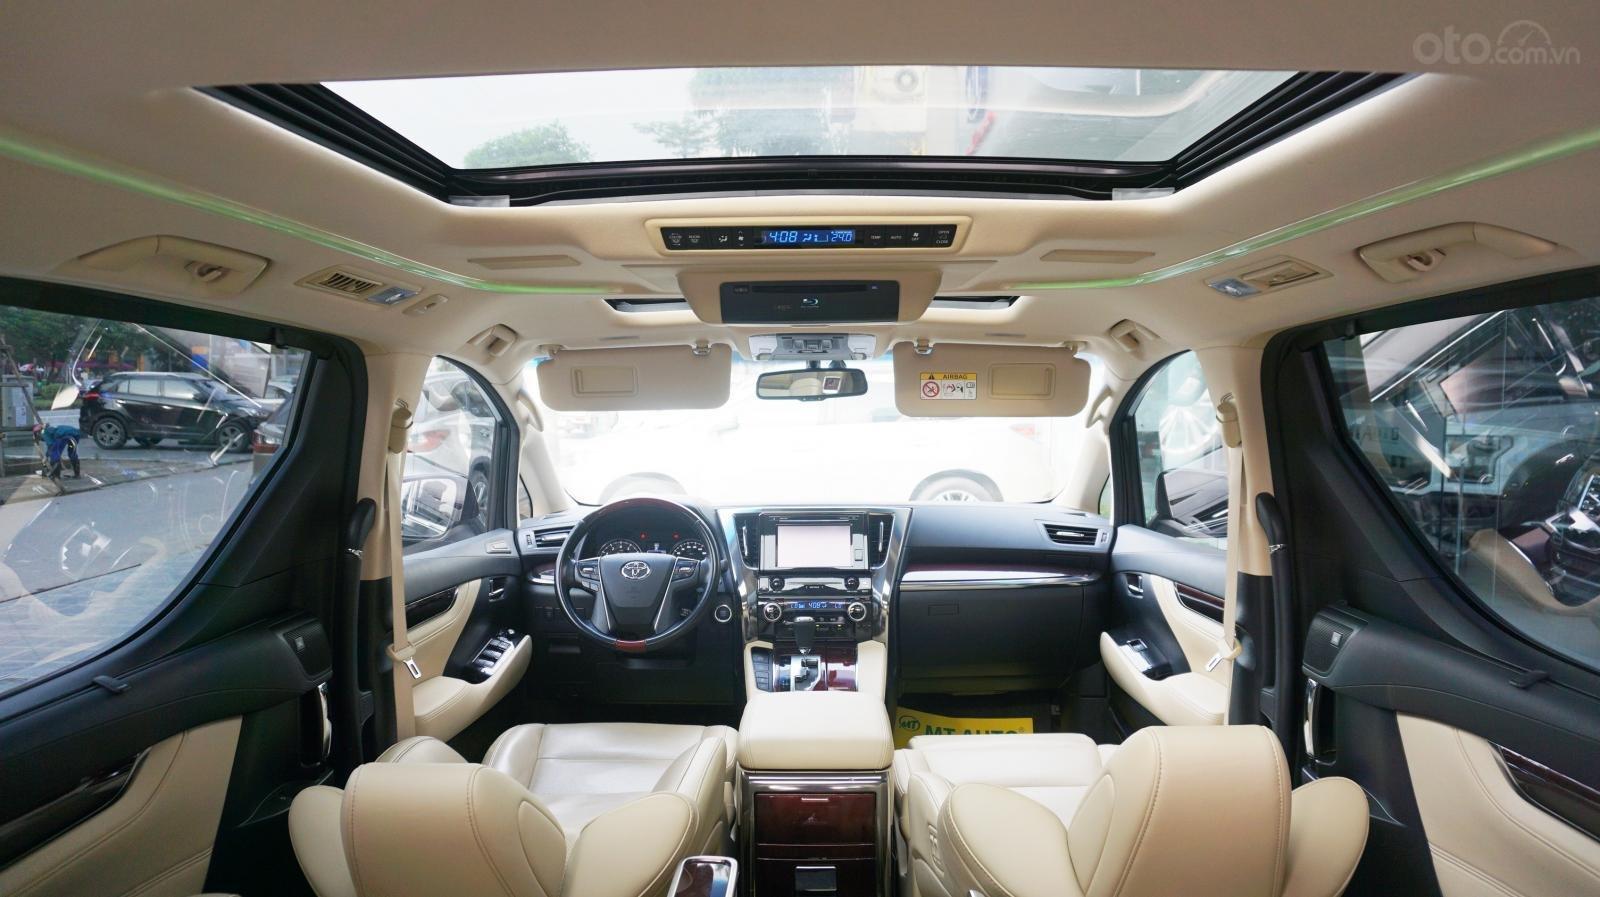 Bán Toyota Alphard 3.5L - V6 sản xuất 2017 model 2018, Mr Huân 0981.0101.61 (4)